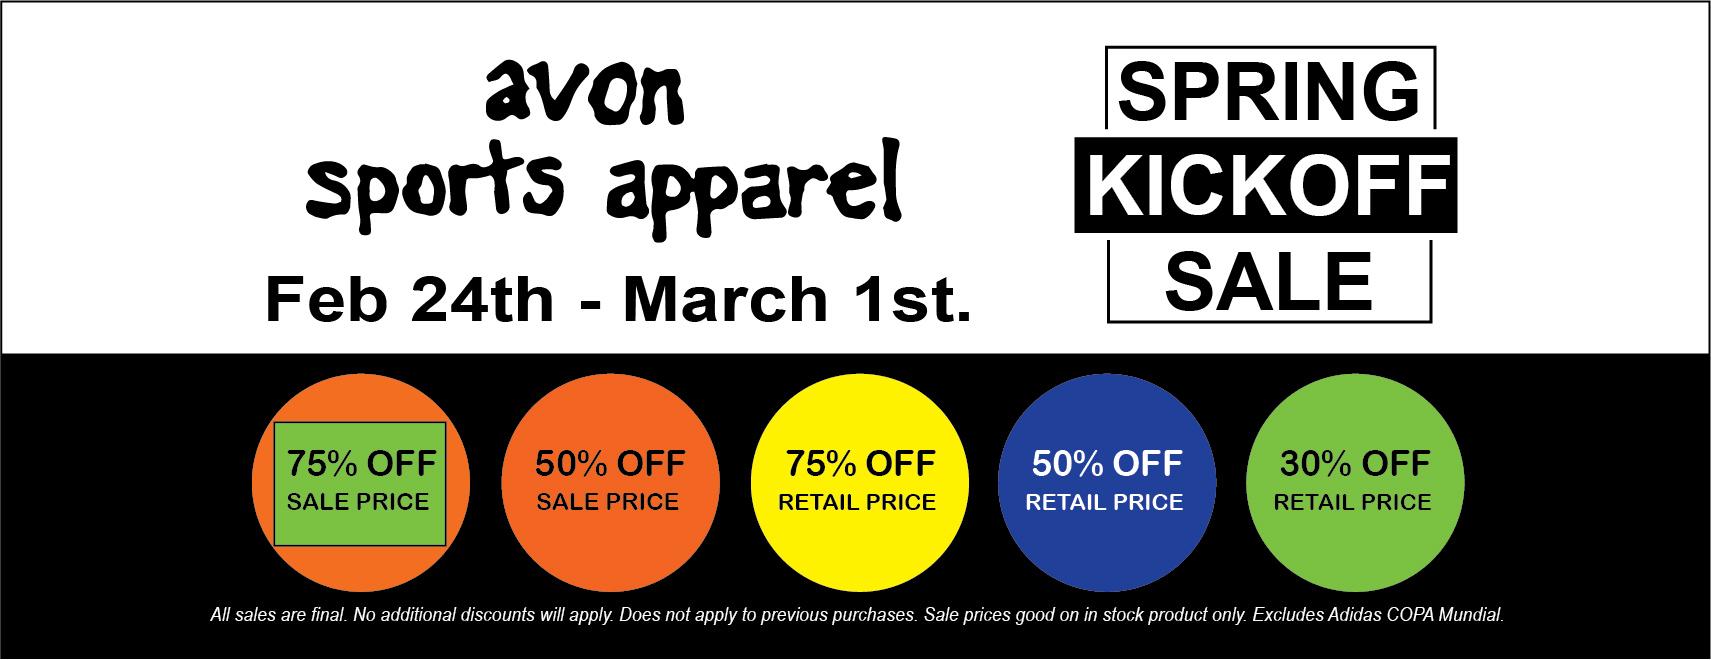 https://avonsportsapparel.com/wp/wp-content/uploads/2020/02/Spring-Kickoff-Sale-Website-01-01.jpg